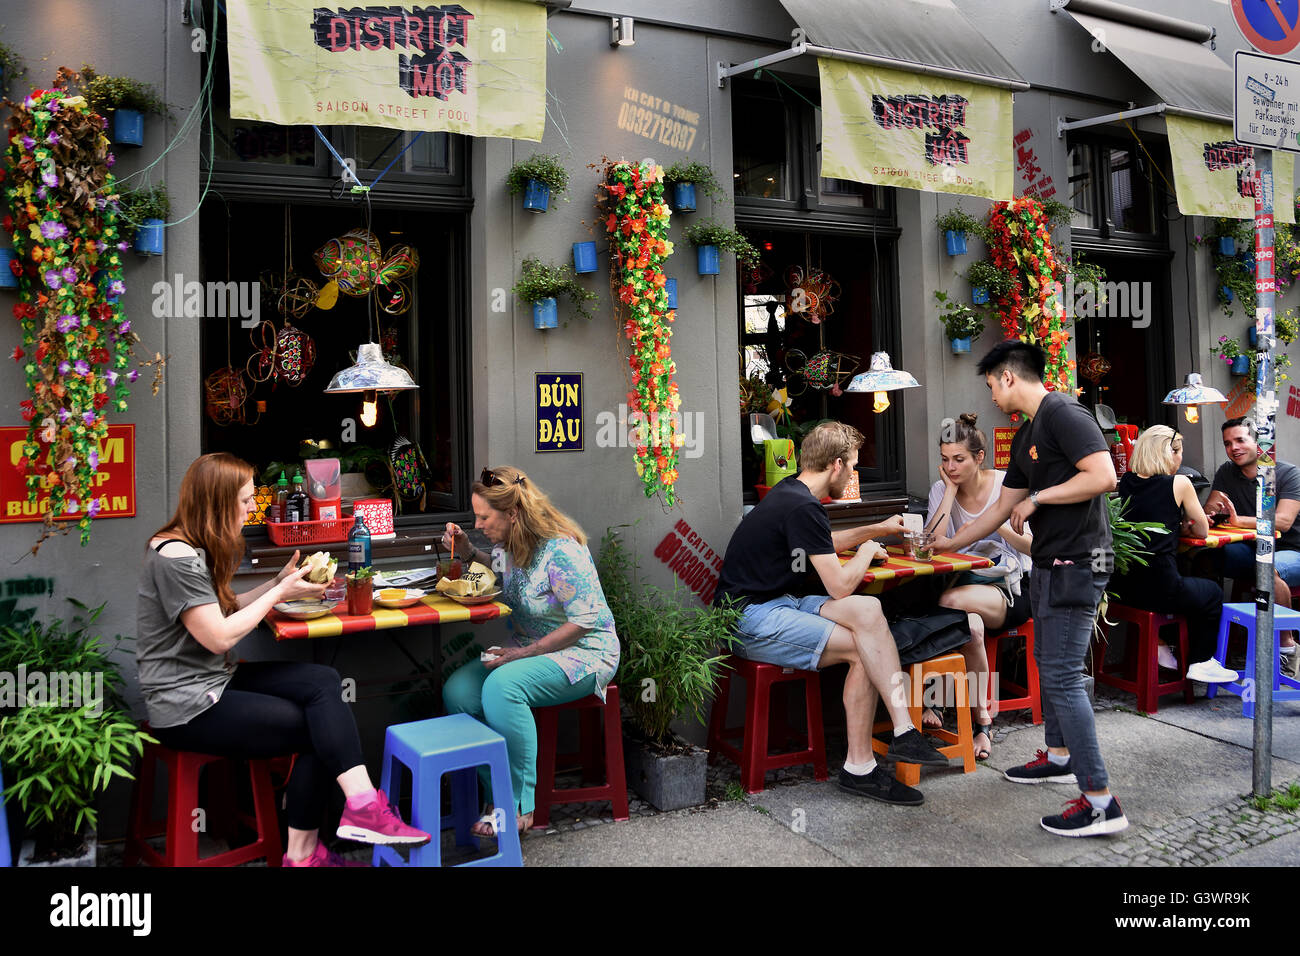 Stock Photo - District Môt - Saigon Street Food Vietnamese Restaurant Mitte, Rosenthaler Strasse Berlin Germany